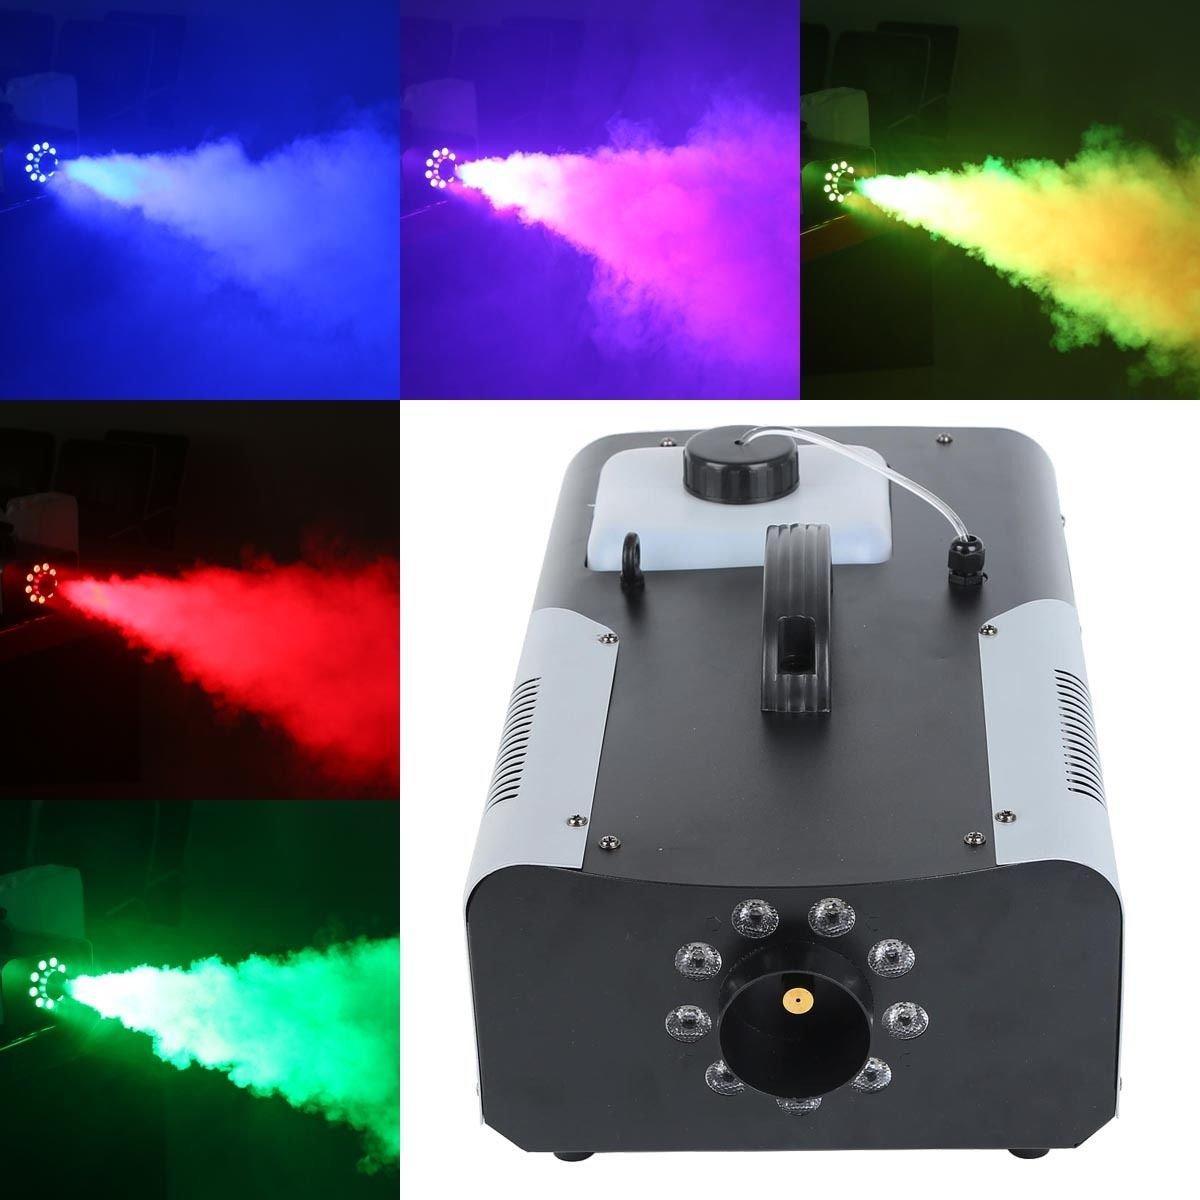 Tengchang 1500W Smoke Fog Machine RGB 8 LED DJ Party Stage Light Wire/Remote Controller J0201546X-US